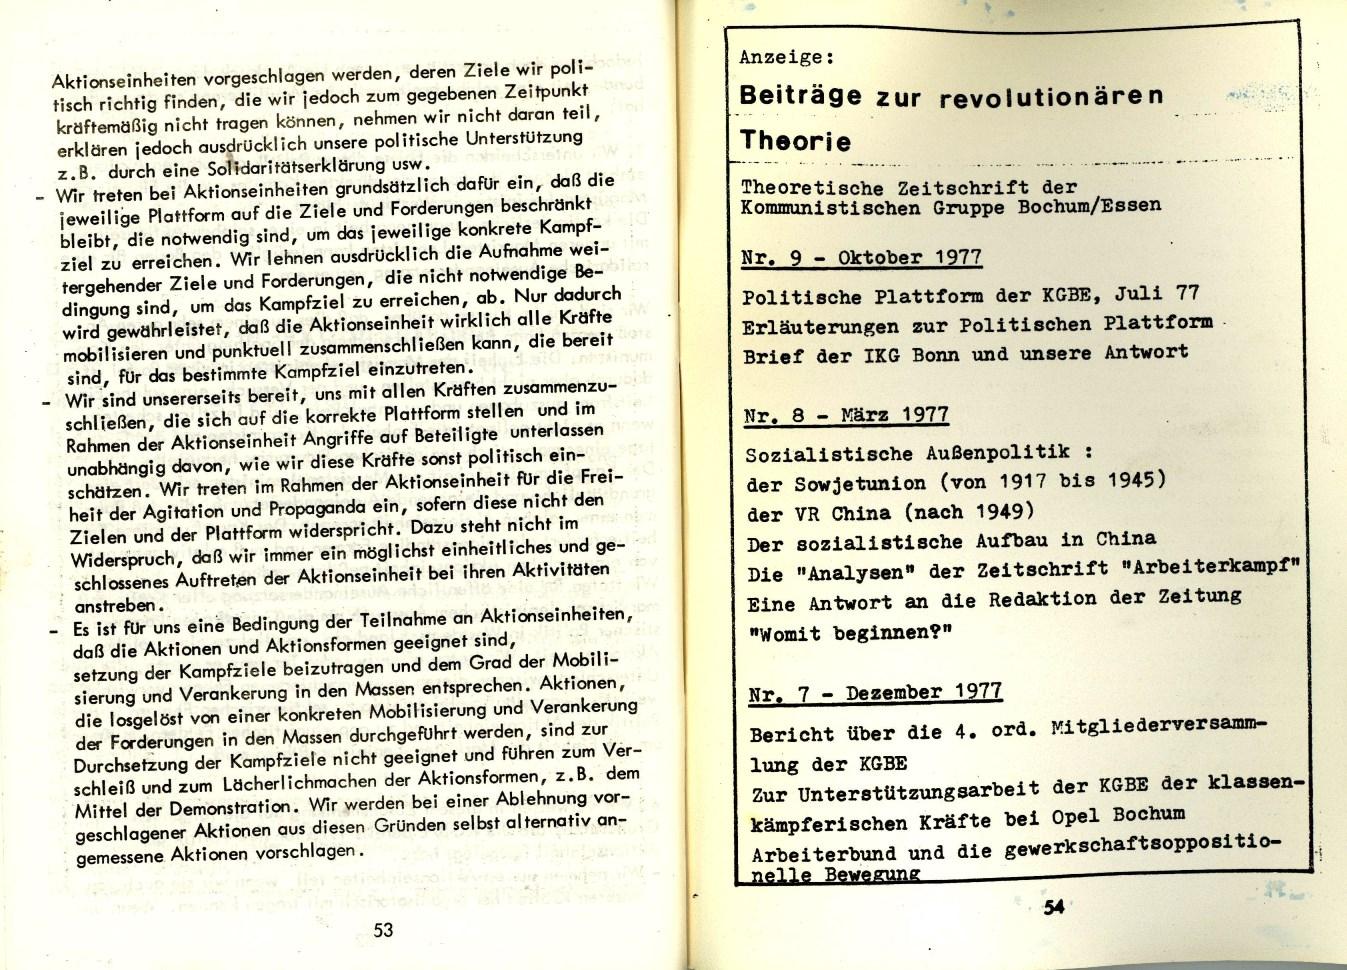 KGBE_1978_Resolutionen_28